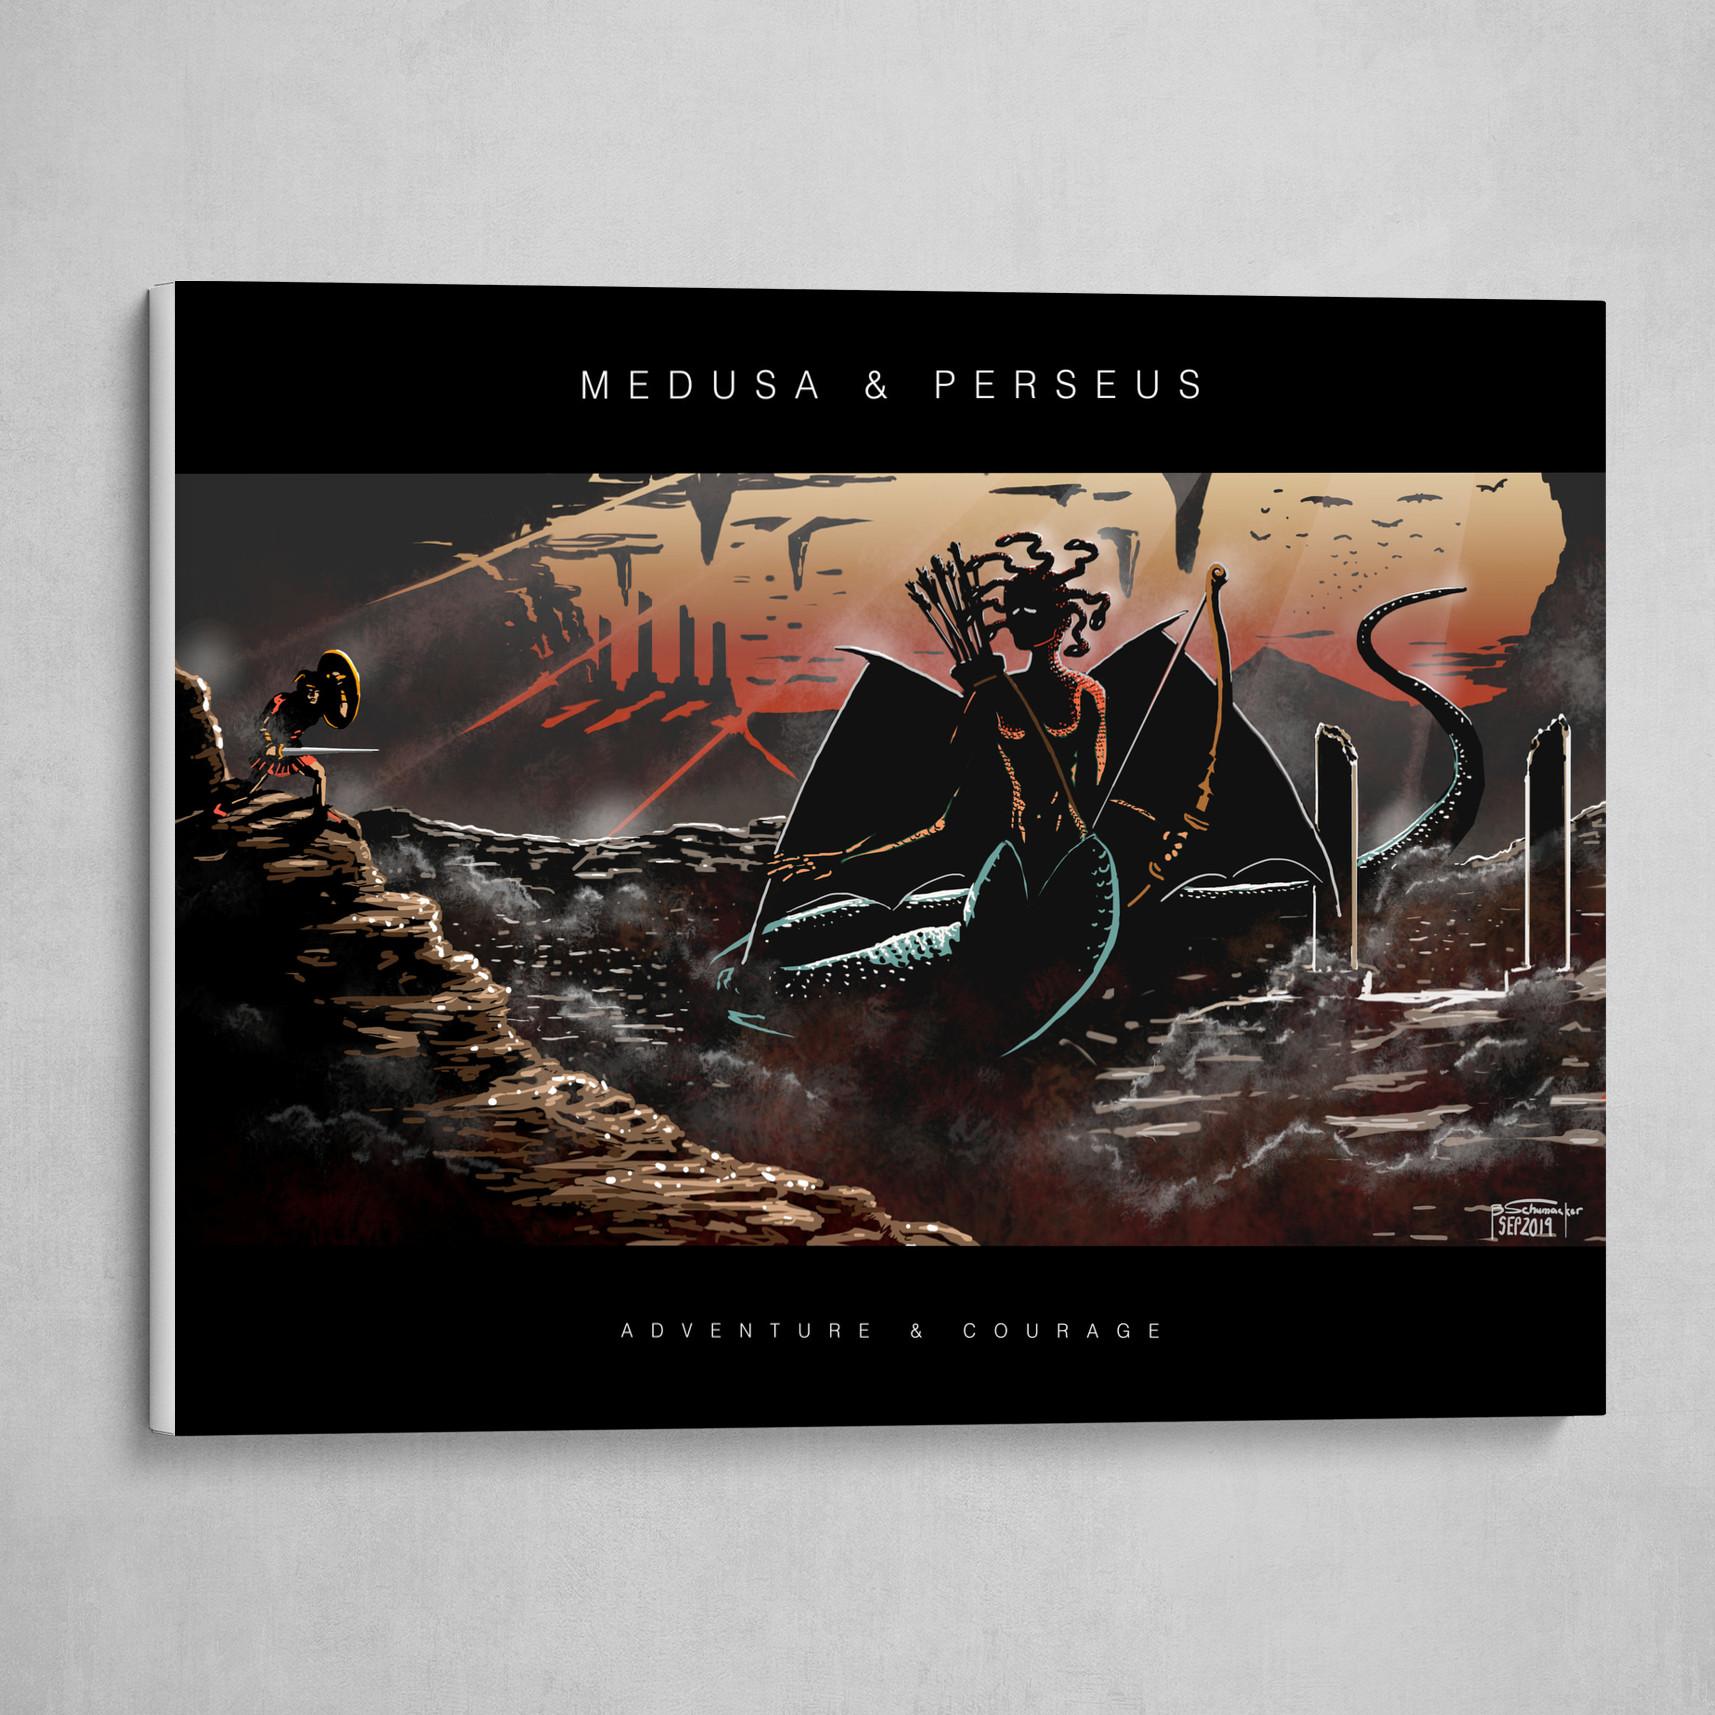 Medusa & Perseus - Poster